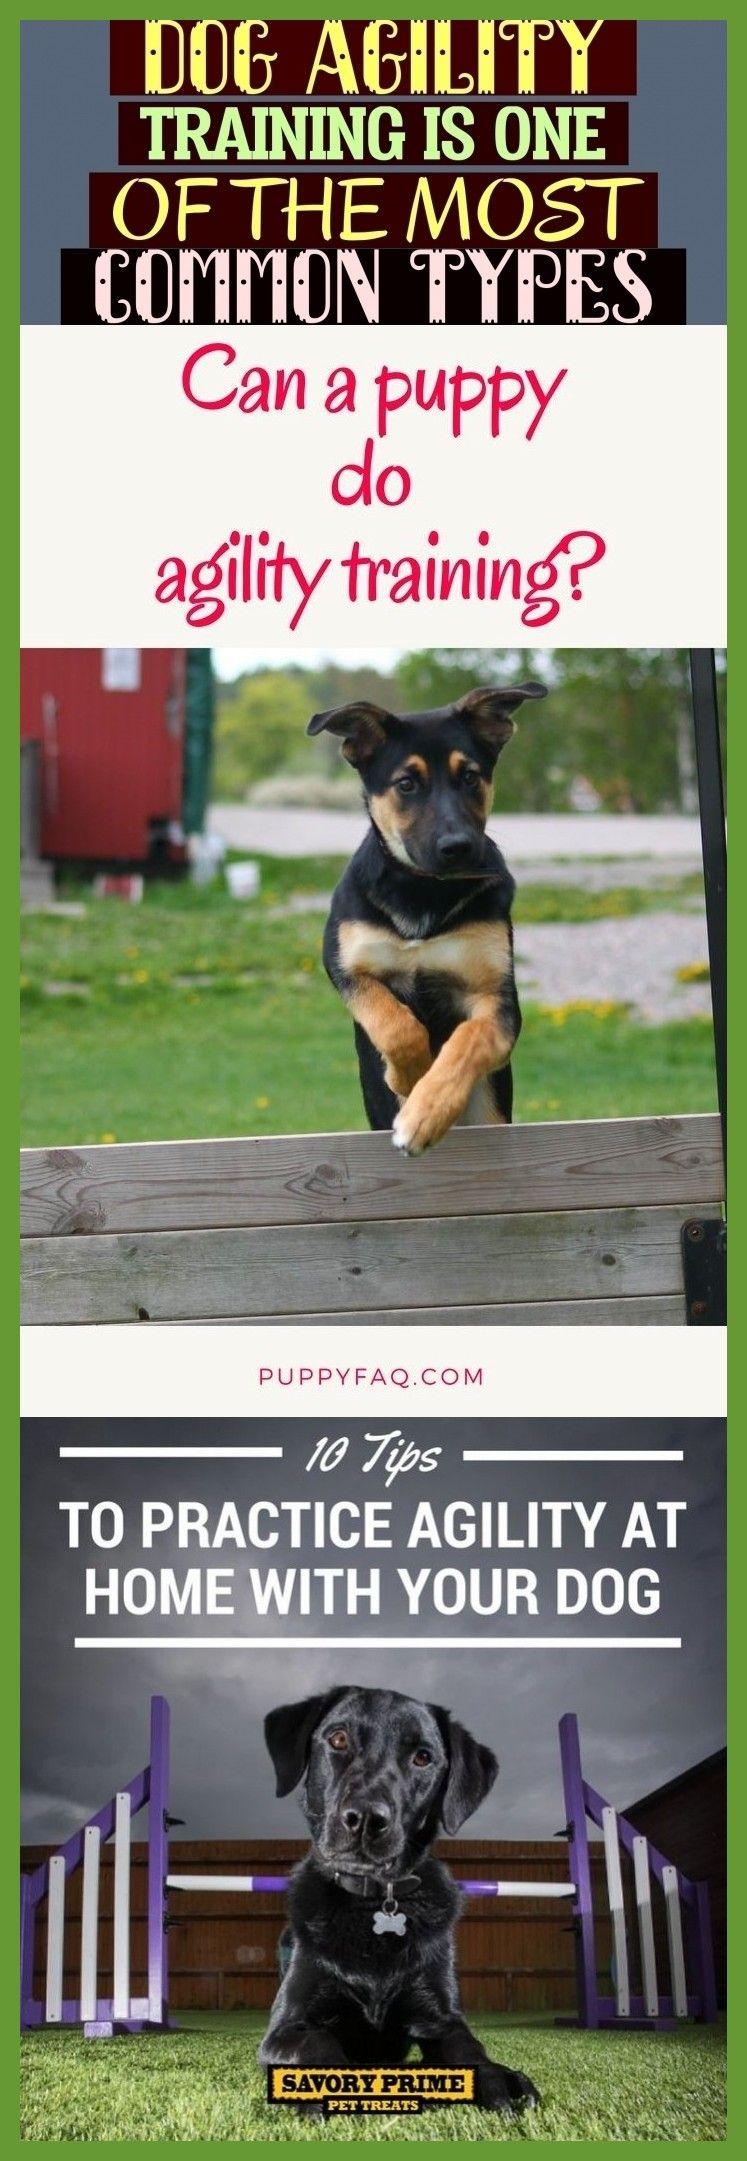 Dog agility training 45de56b3c1a8e3 with images